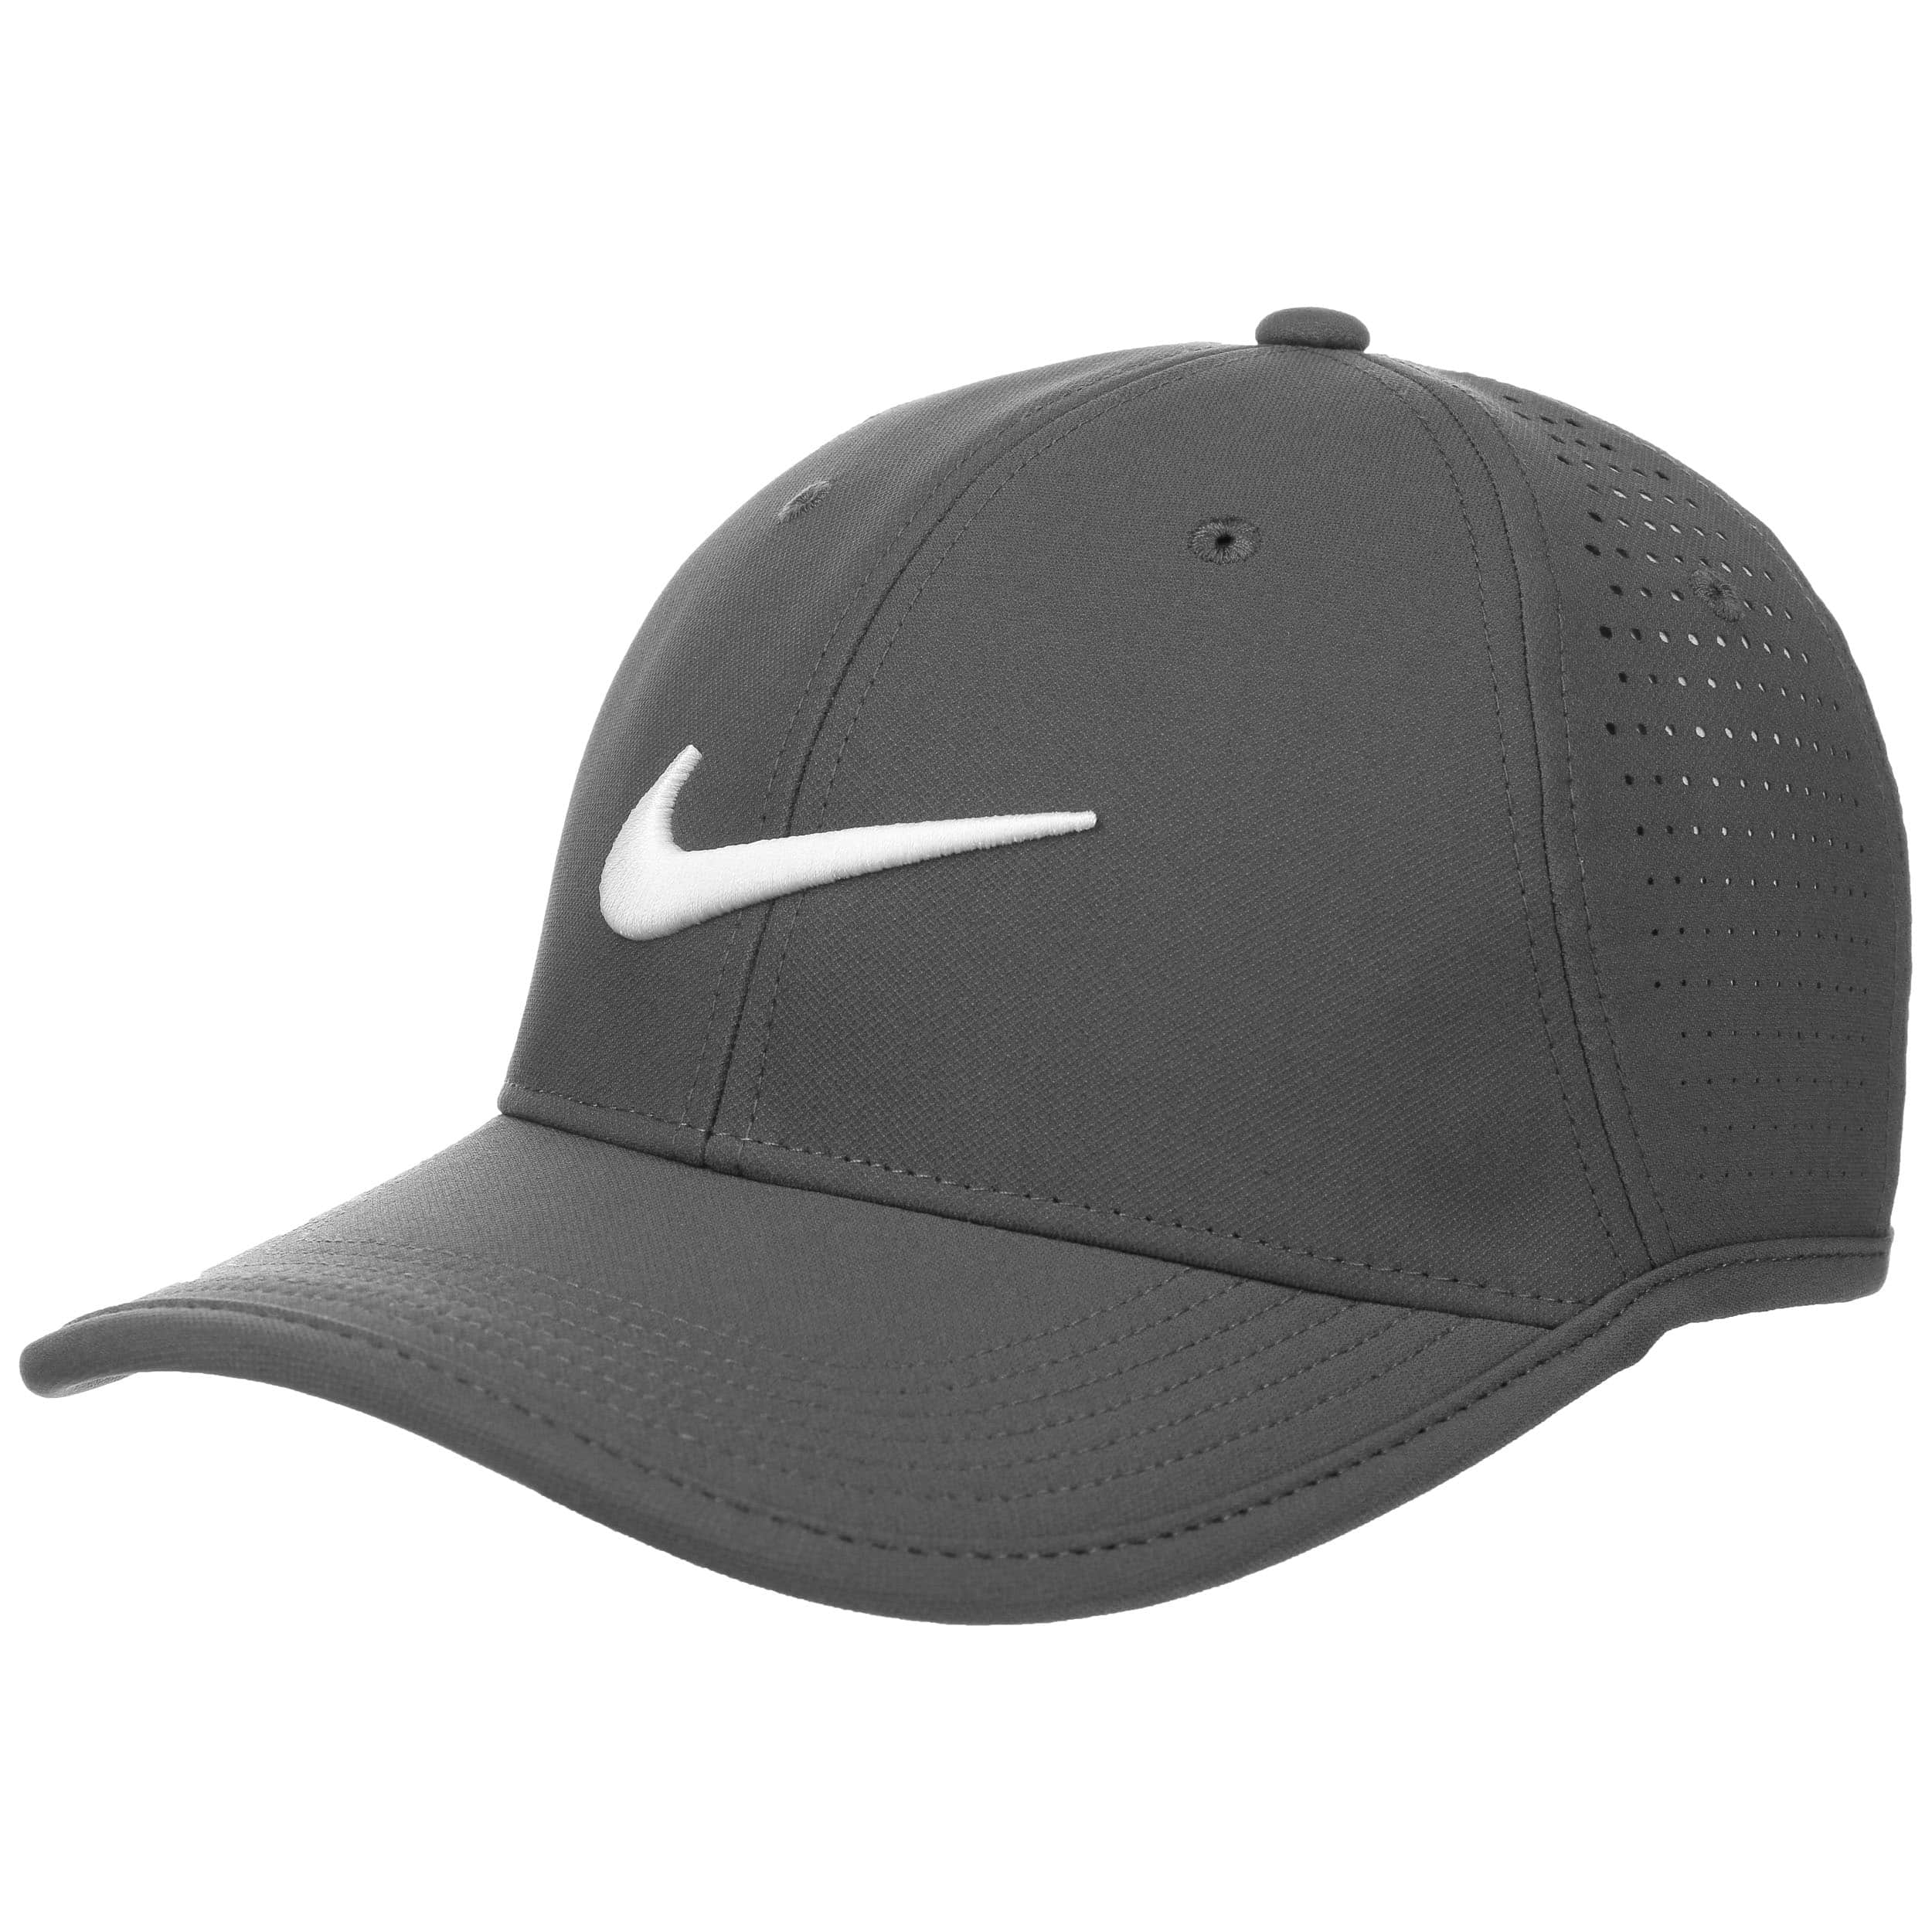 Gorra Ultralight Tour Perforation by Nike - Gorras - sombreroshop.es 1127efda39b